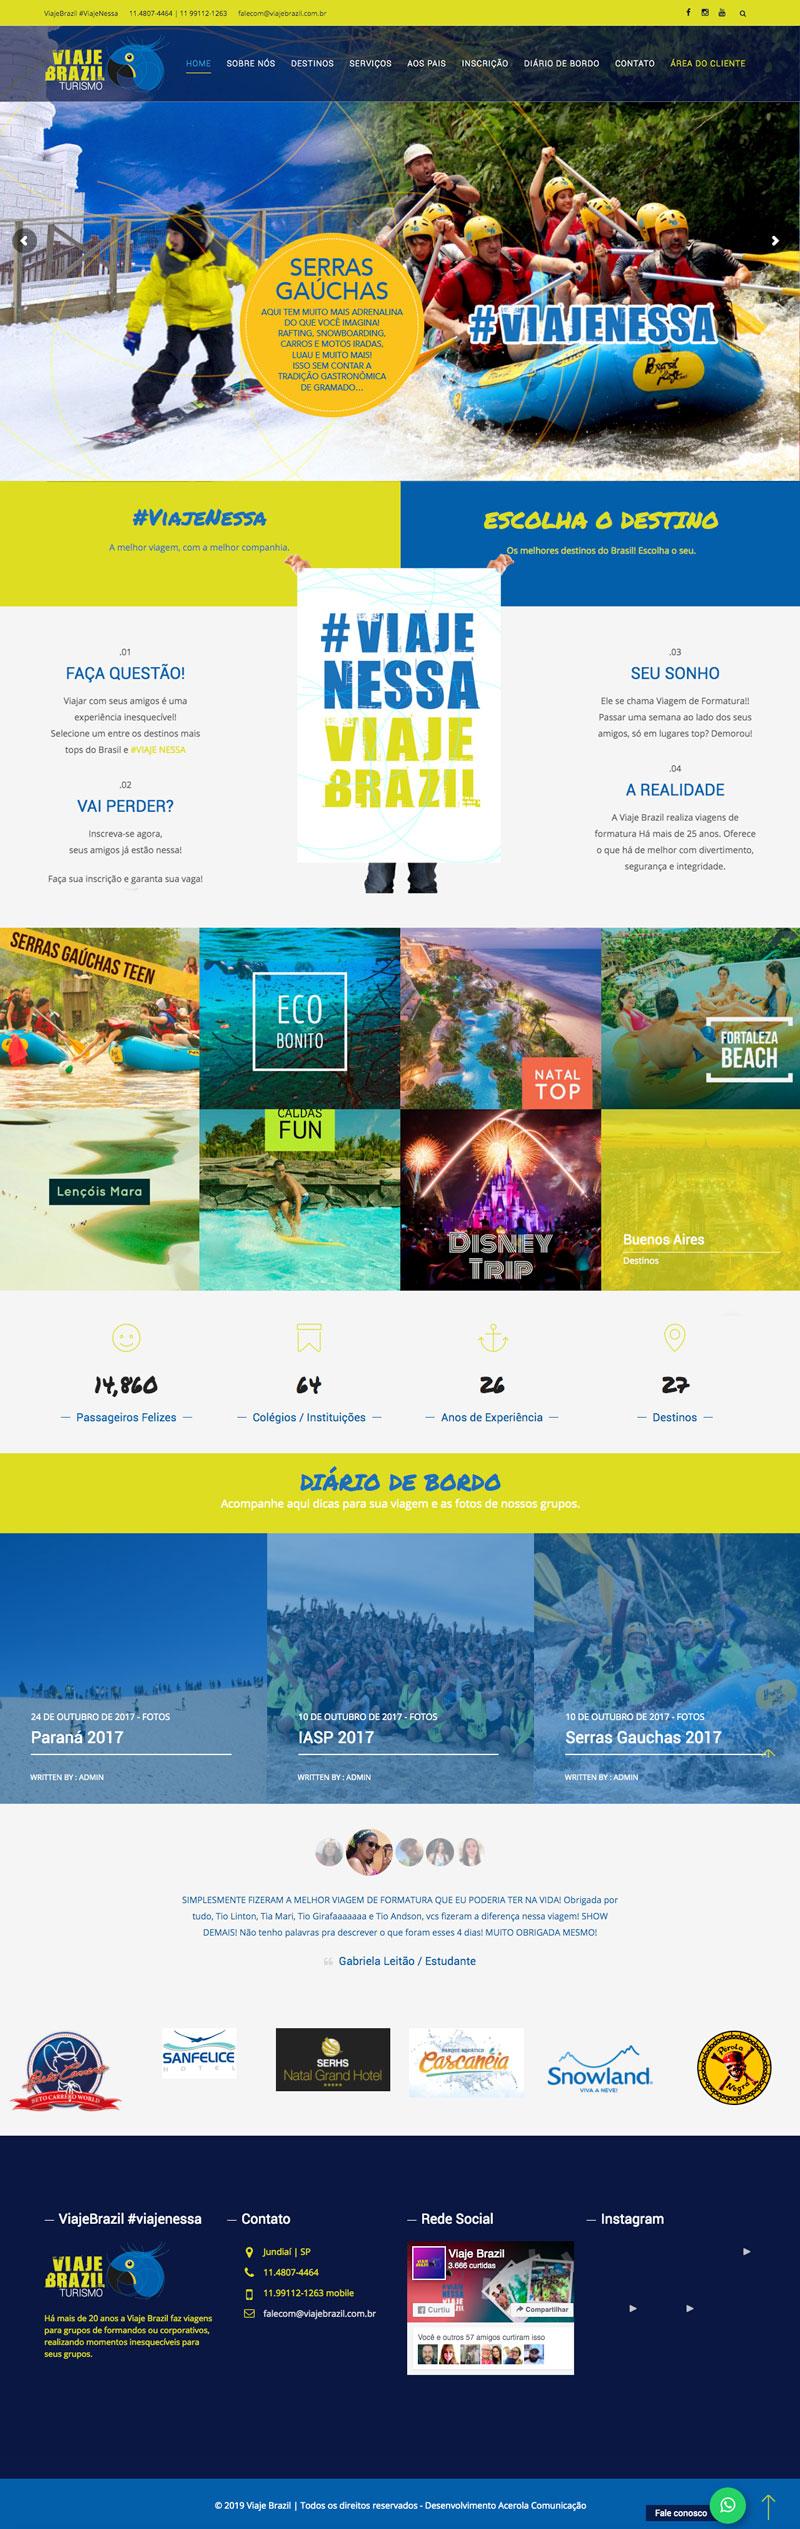 website_viajebrazil